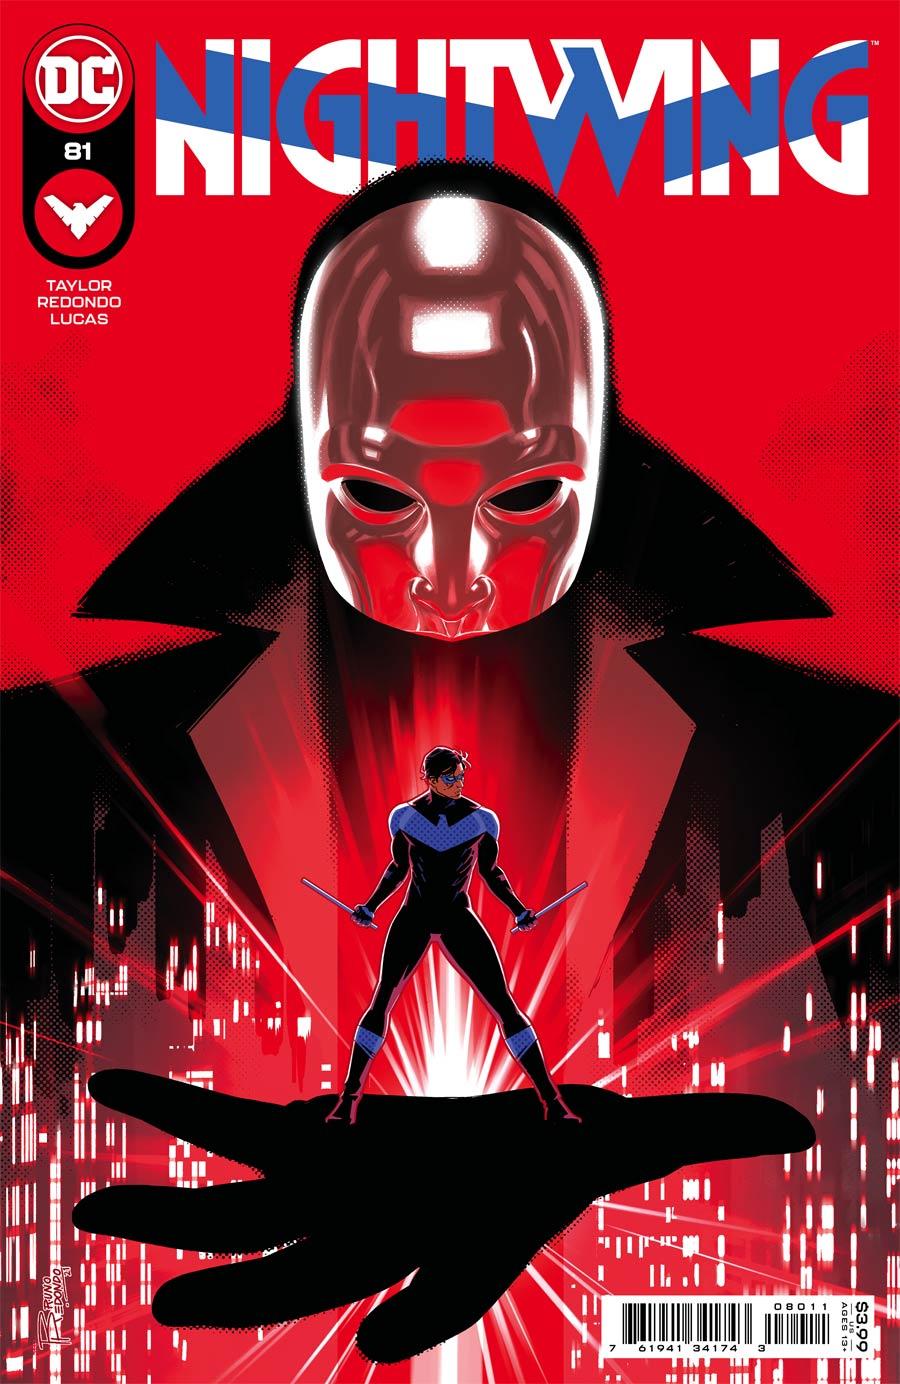 Nightwing Vol 4 #81 Cover A Regular Bruno Redondo Cover (Limit 1 Per Customer)